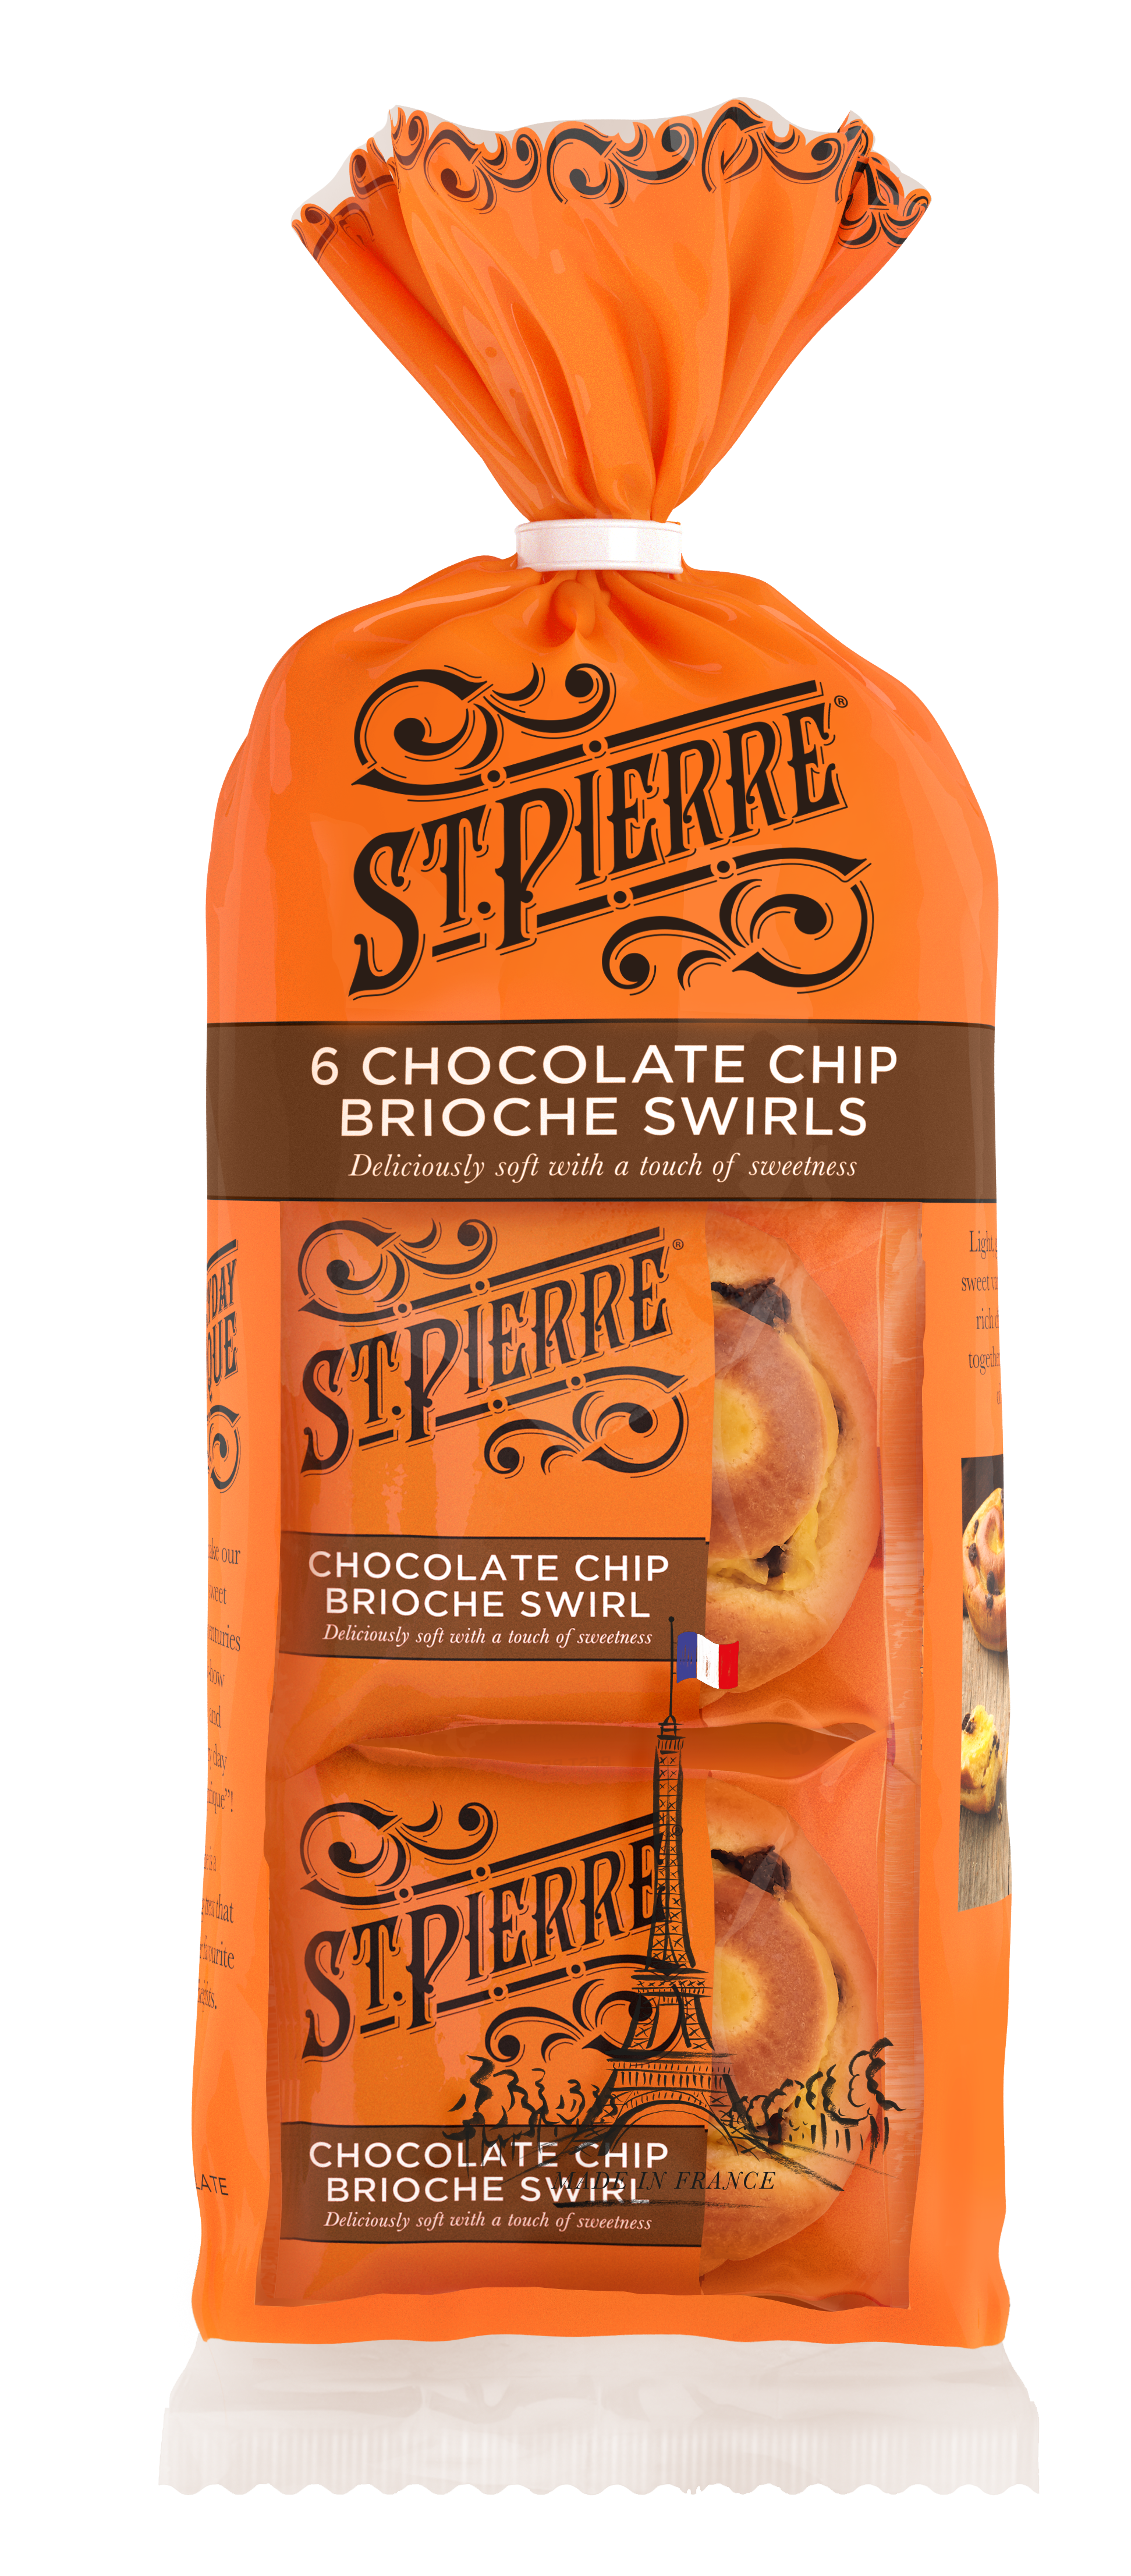 A pack of six St Pierre chocolate chip brioche swirls inside packaging